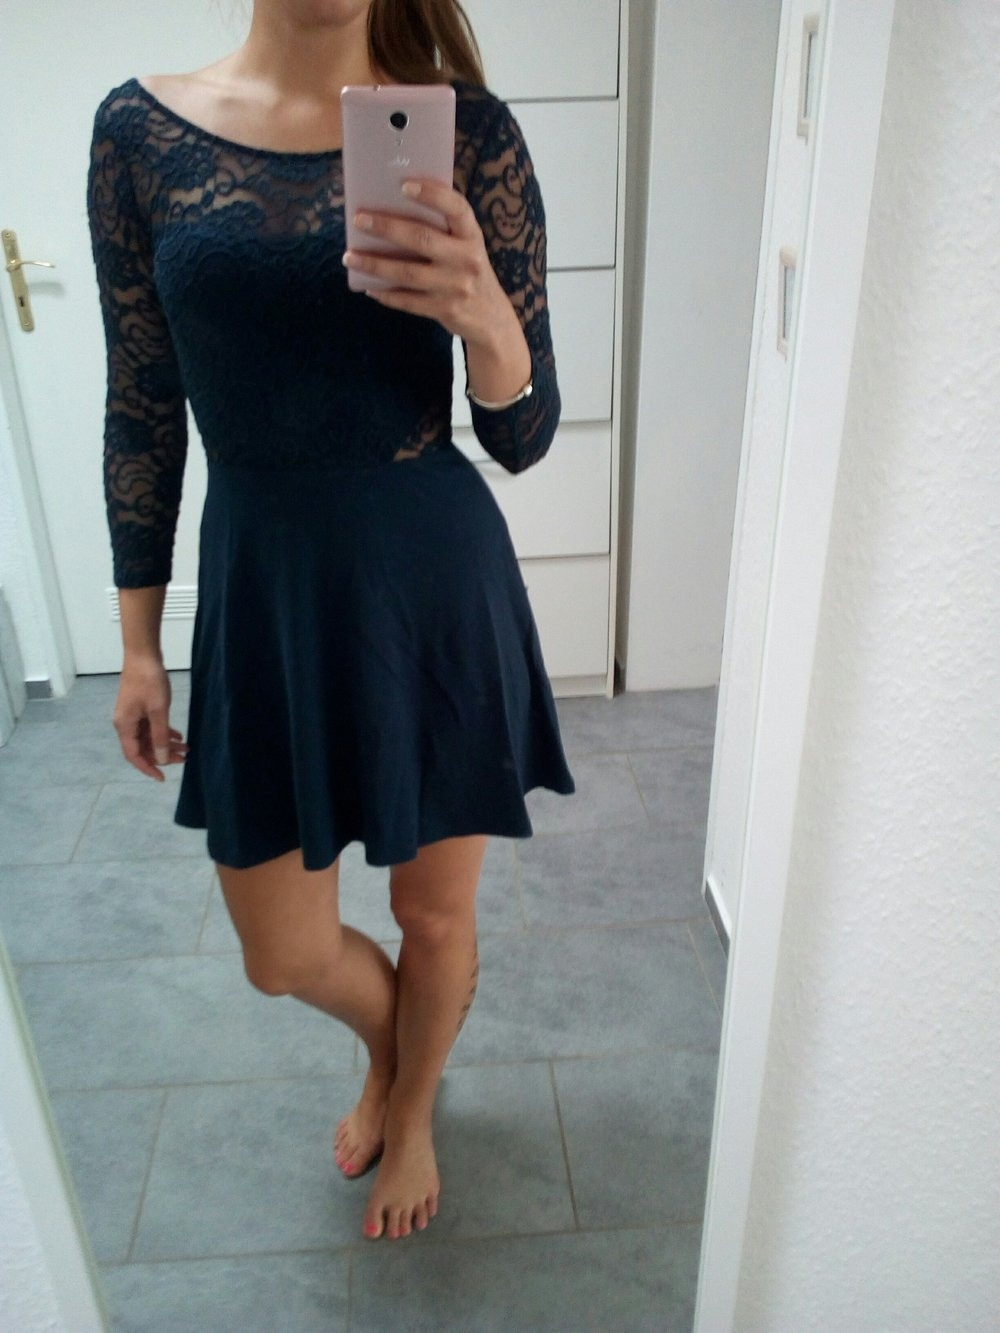 Formal Wunderbar Dunkelblaues Kleid Spitze für 201920 Schön Dunkelblaues Kleid Spitze Galerie